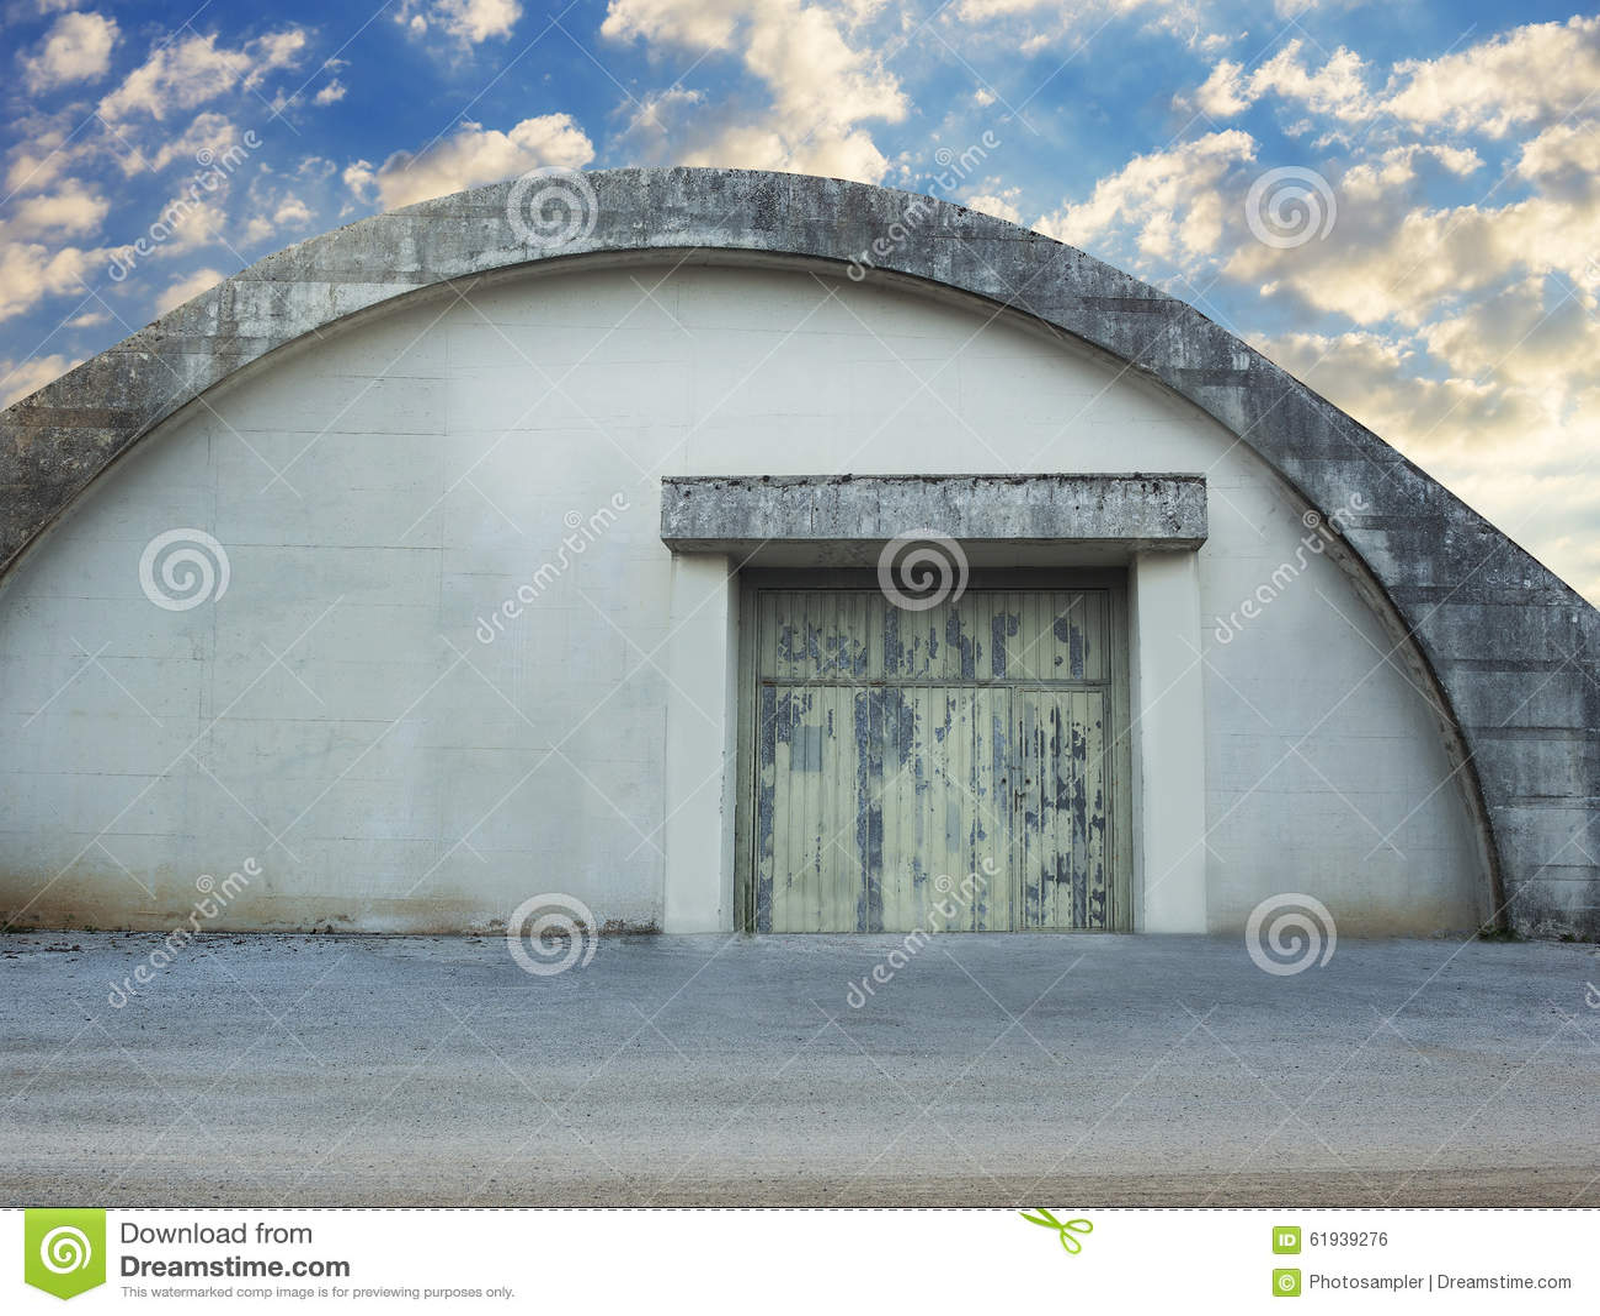 Abandoned Military Hangar Stock Photo